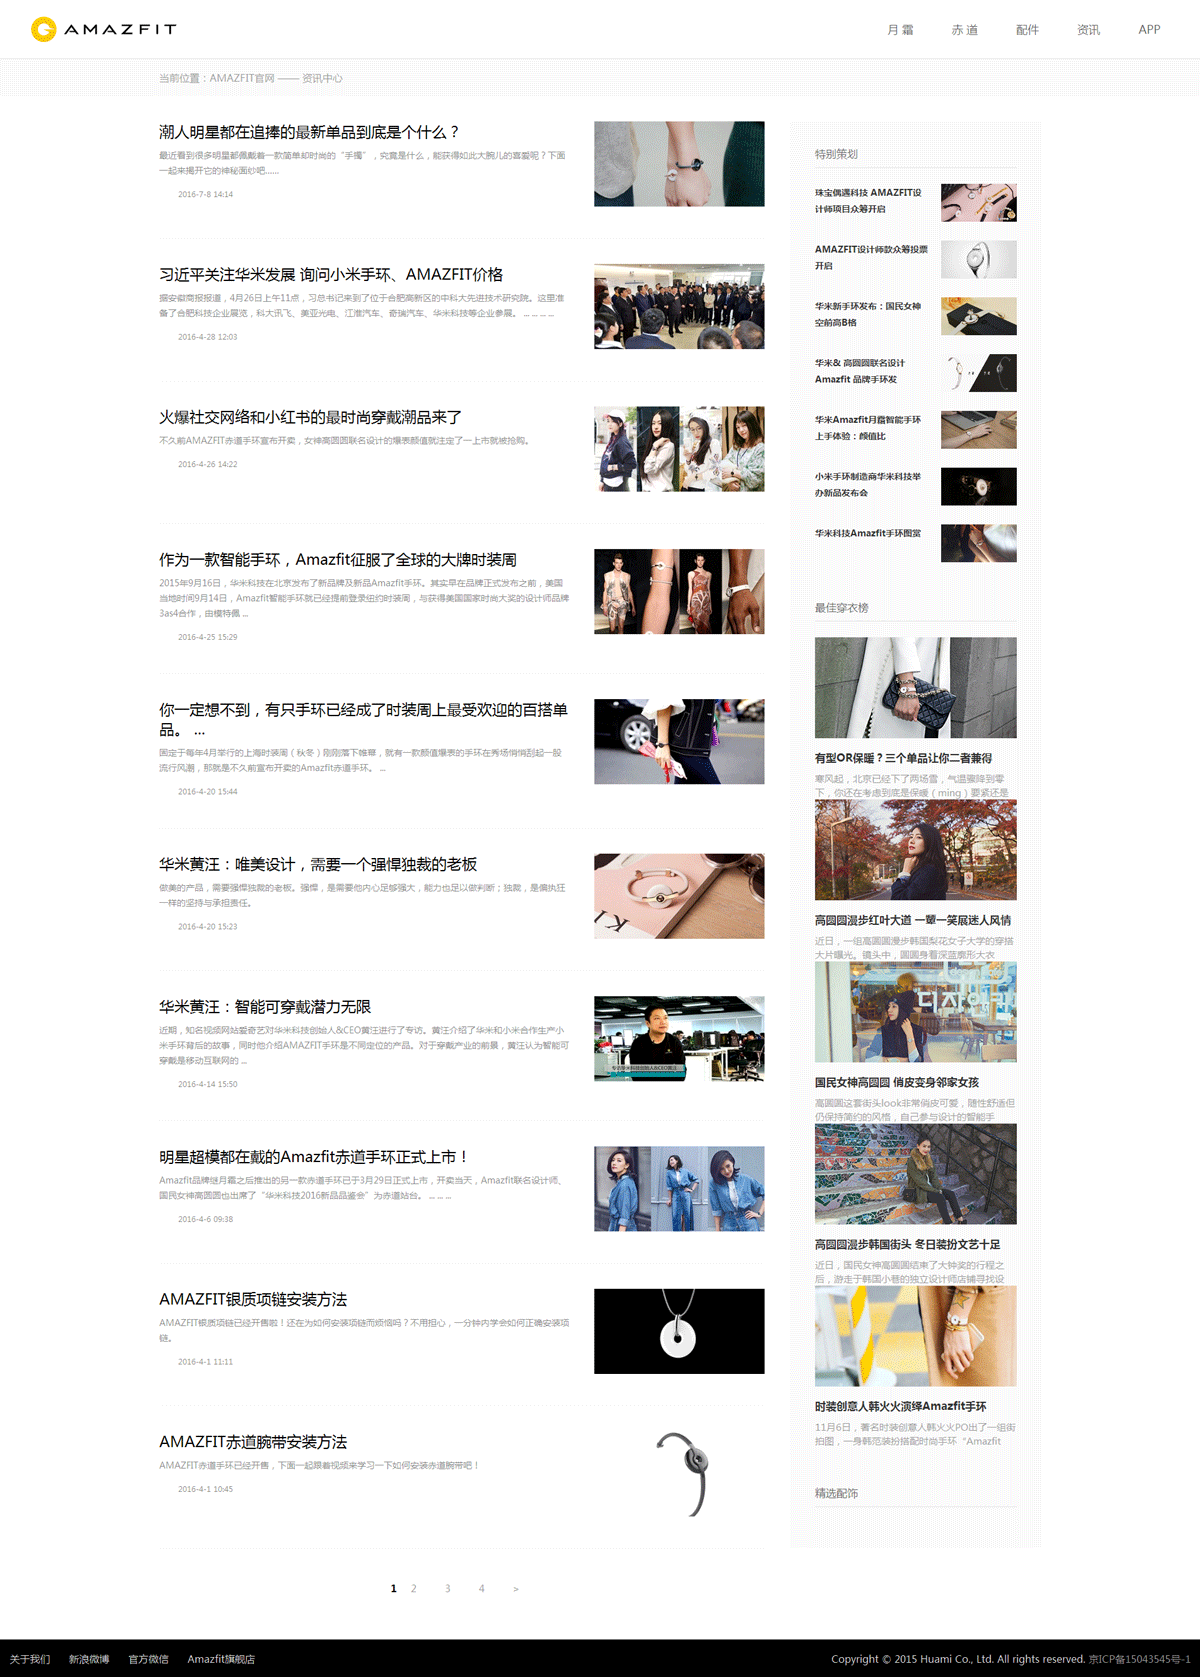 华米科技 AMAZFIT网站设计